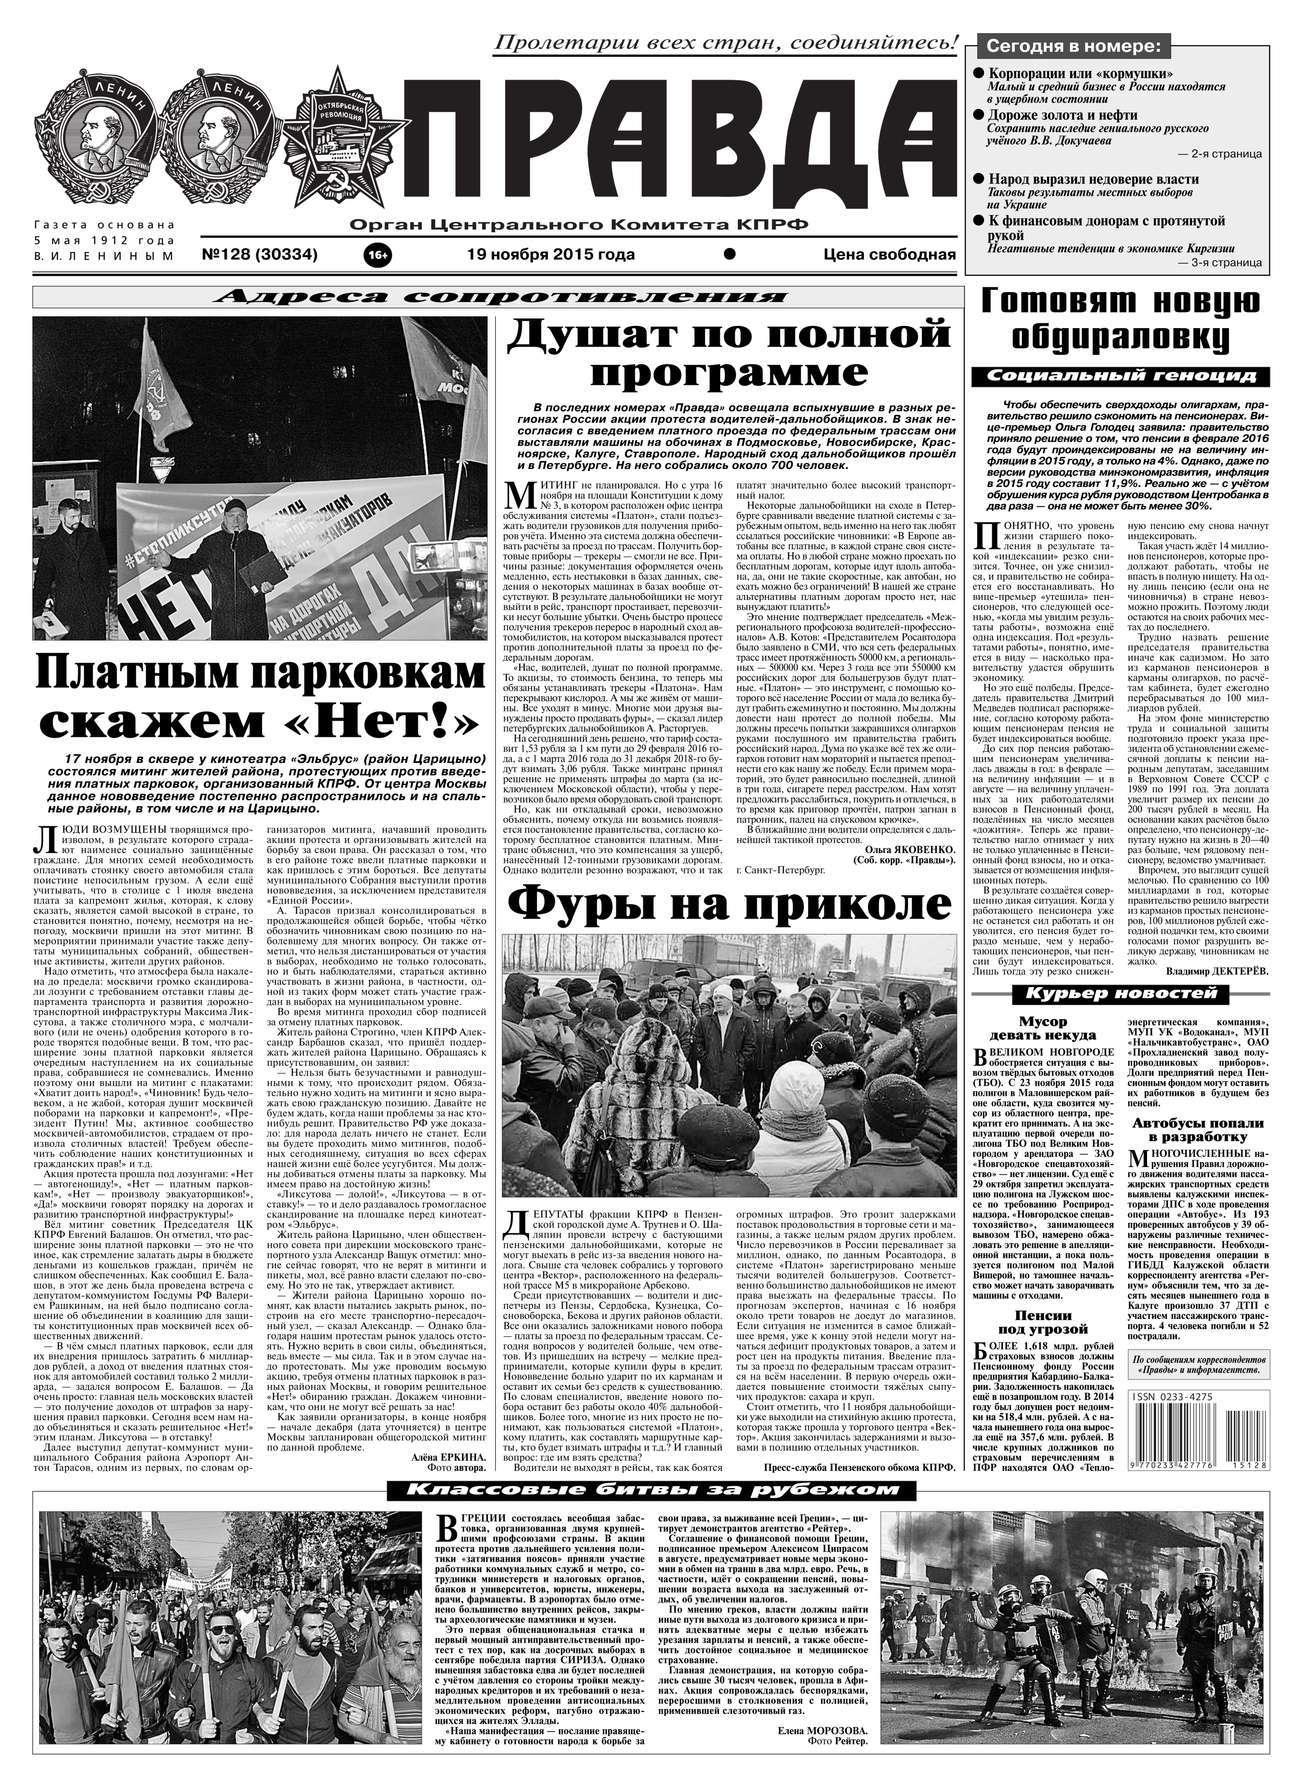 Редакция газеты Правда Правда 128-2015 юбка artka qa150552 128 2015 q115055x